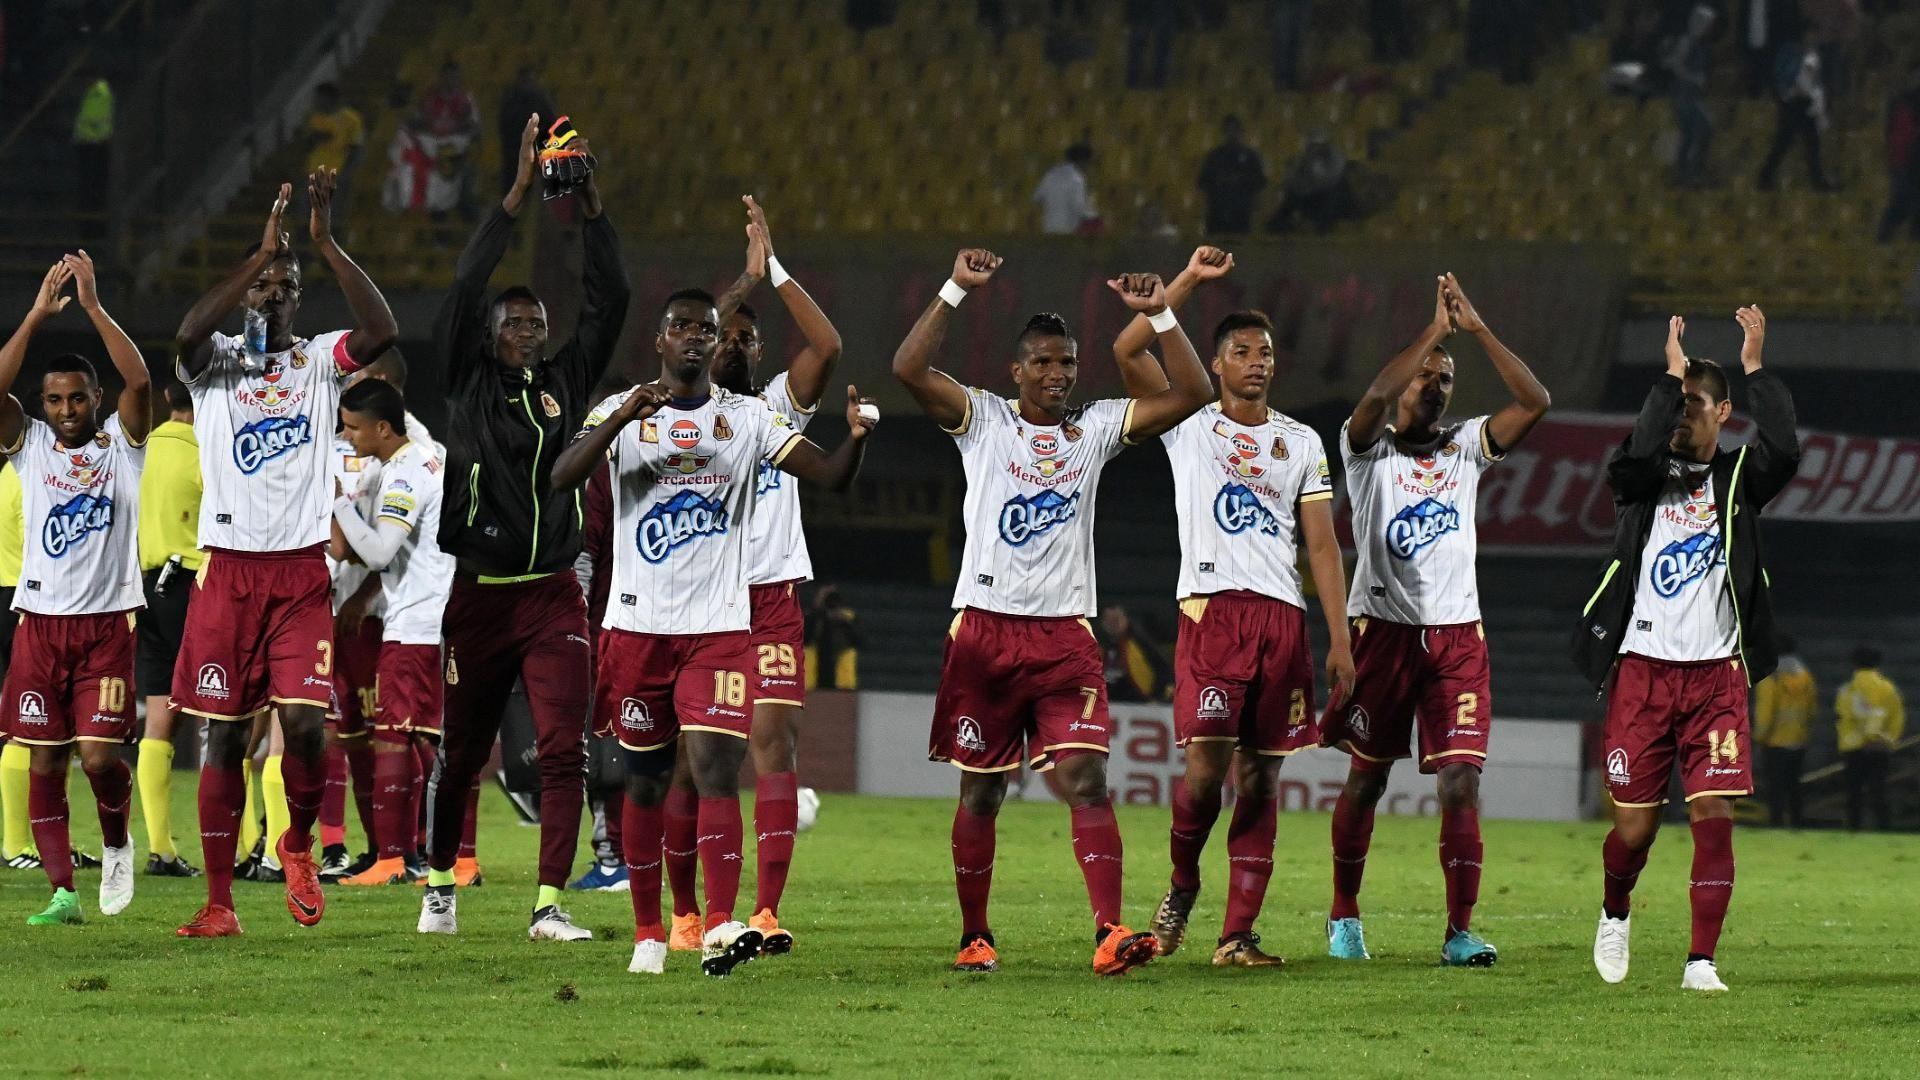 ¿Podrá el Tolima superar la fase de grupos de la Libertadores?